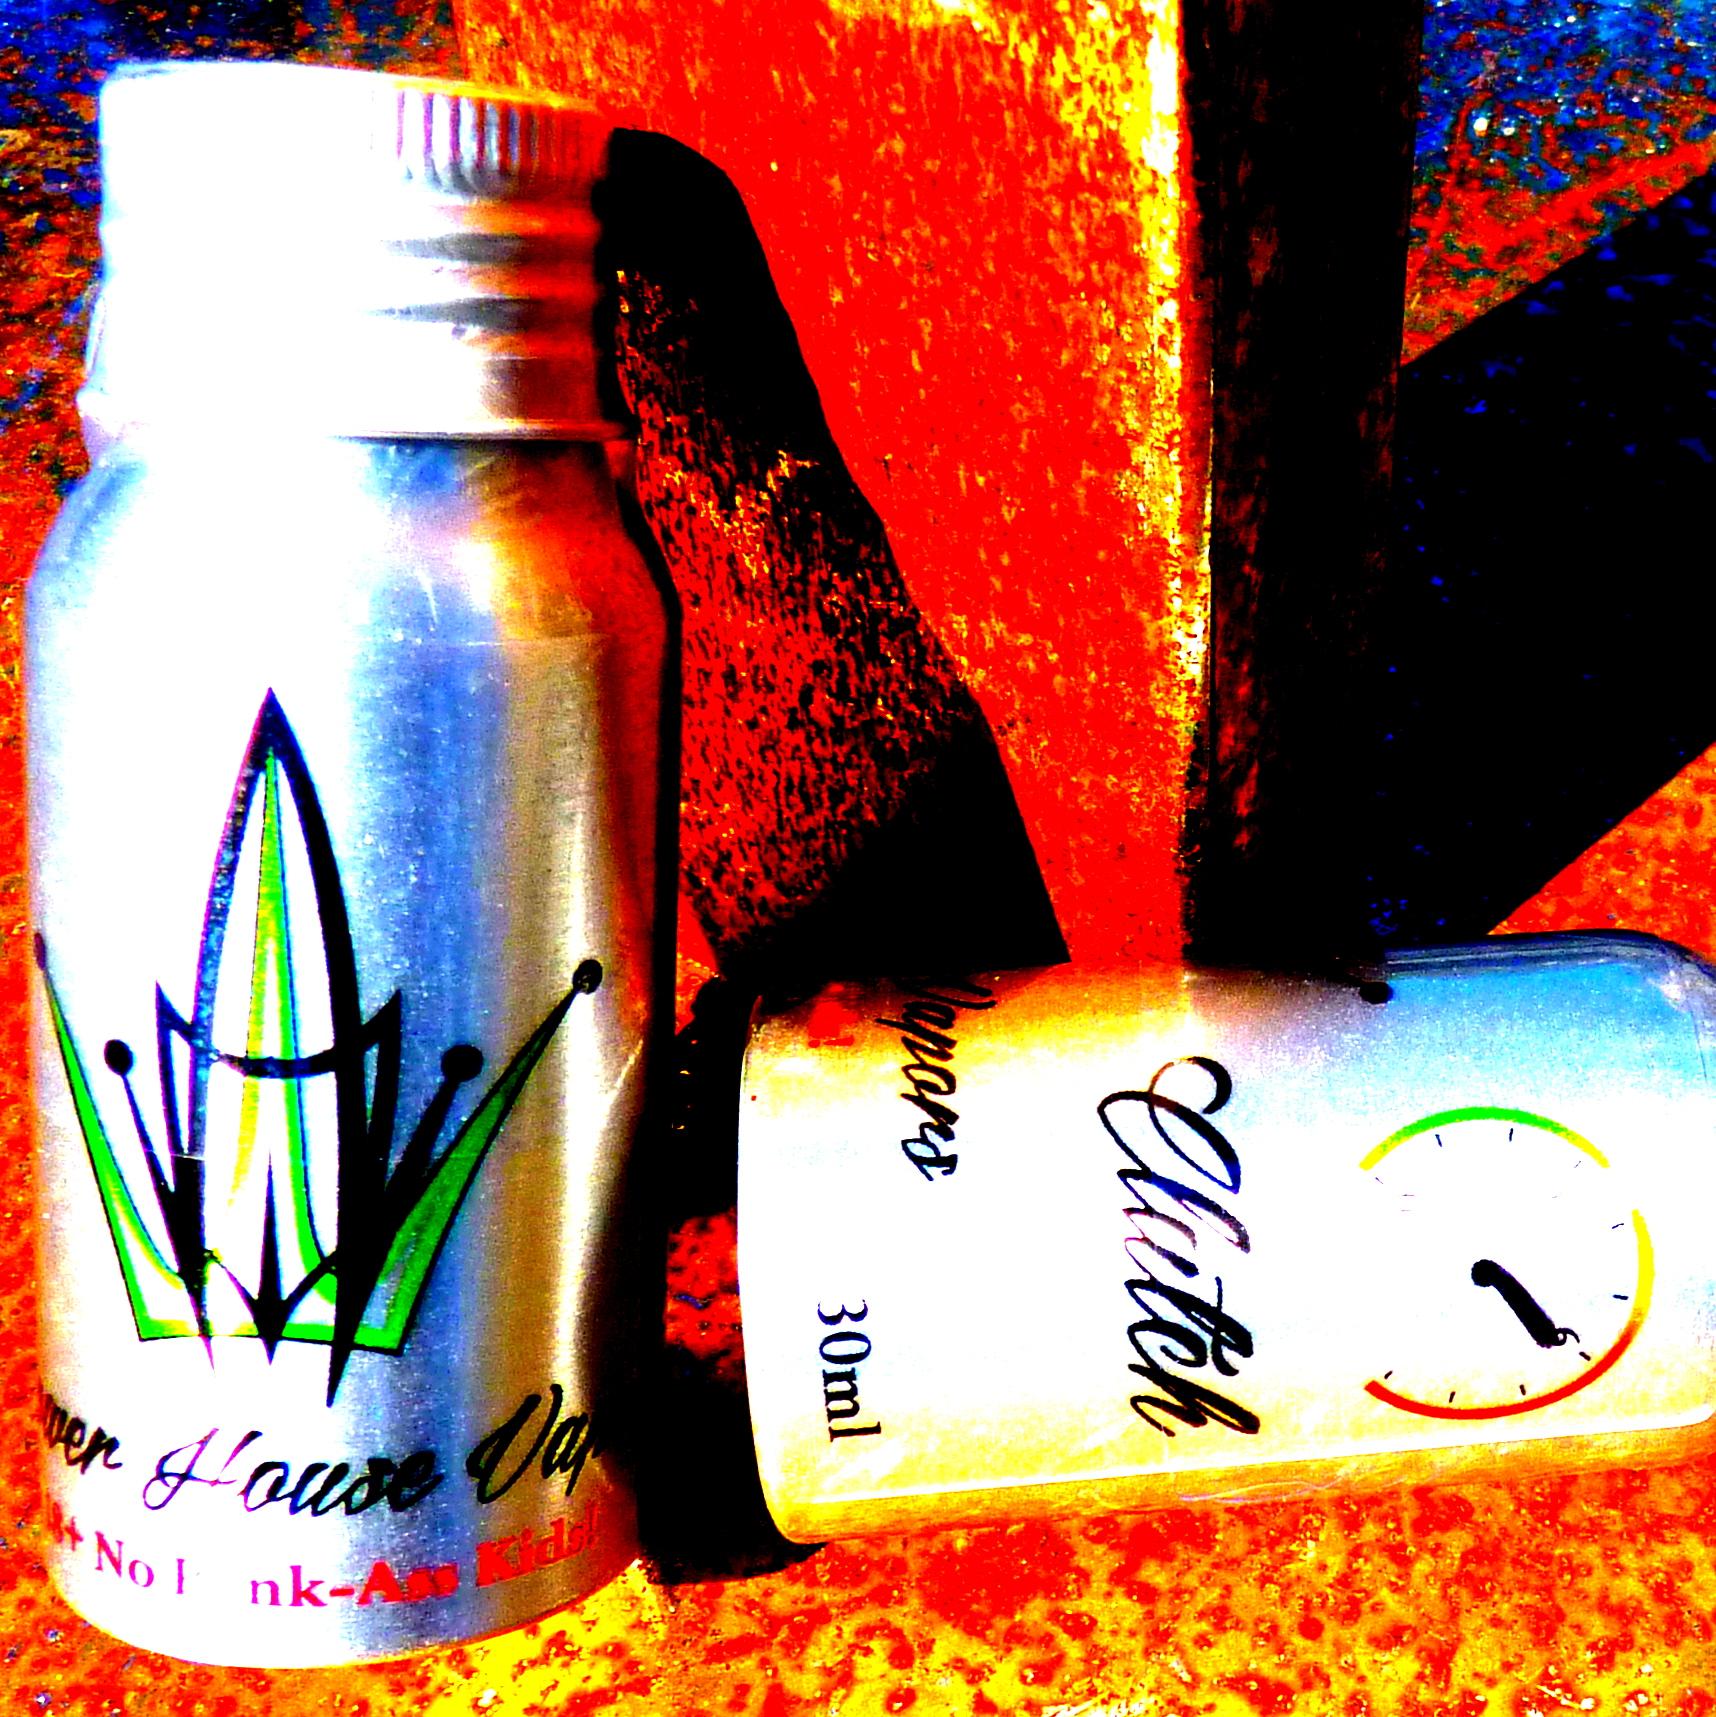 island_vape_shop_power_house_powerhouse_vapors_dripping_fuel_cells_e-juice.jpg